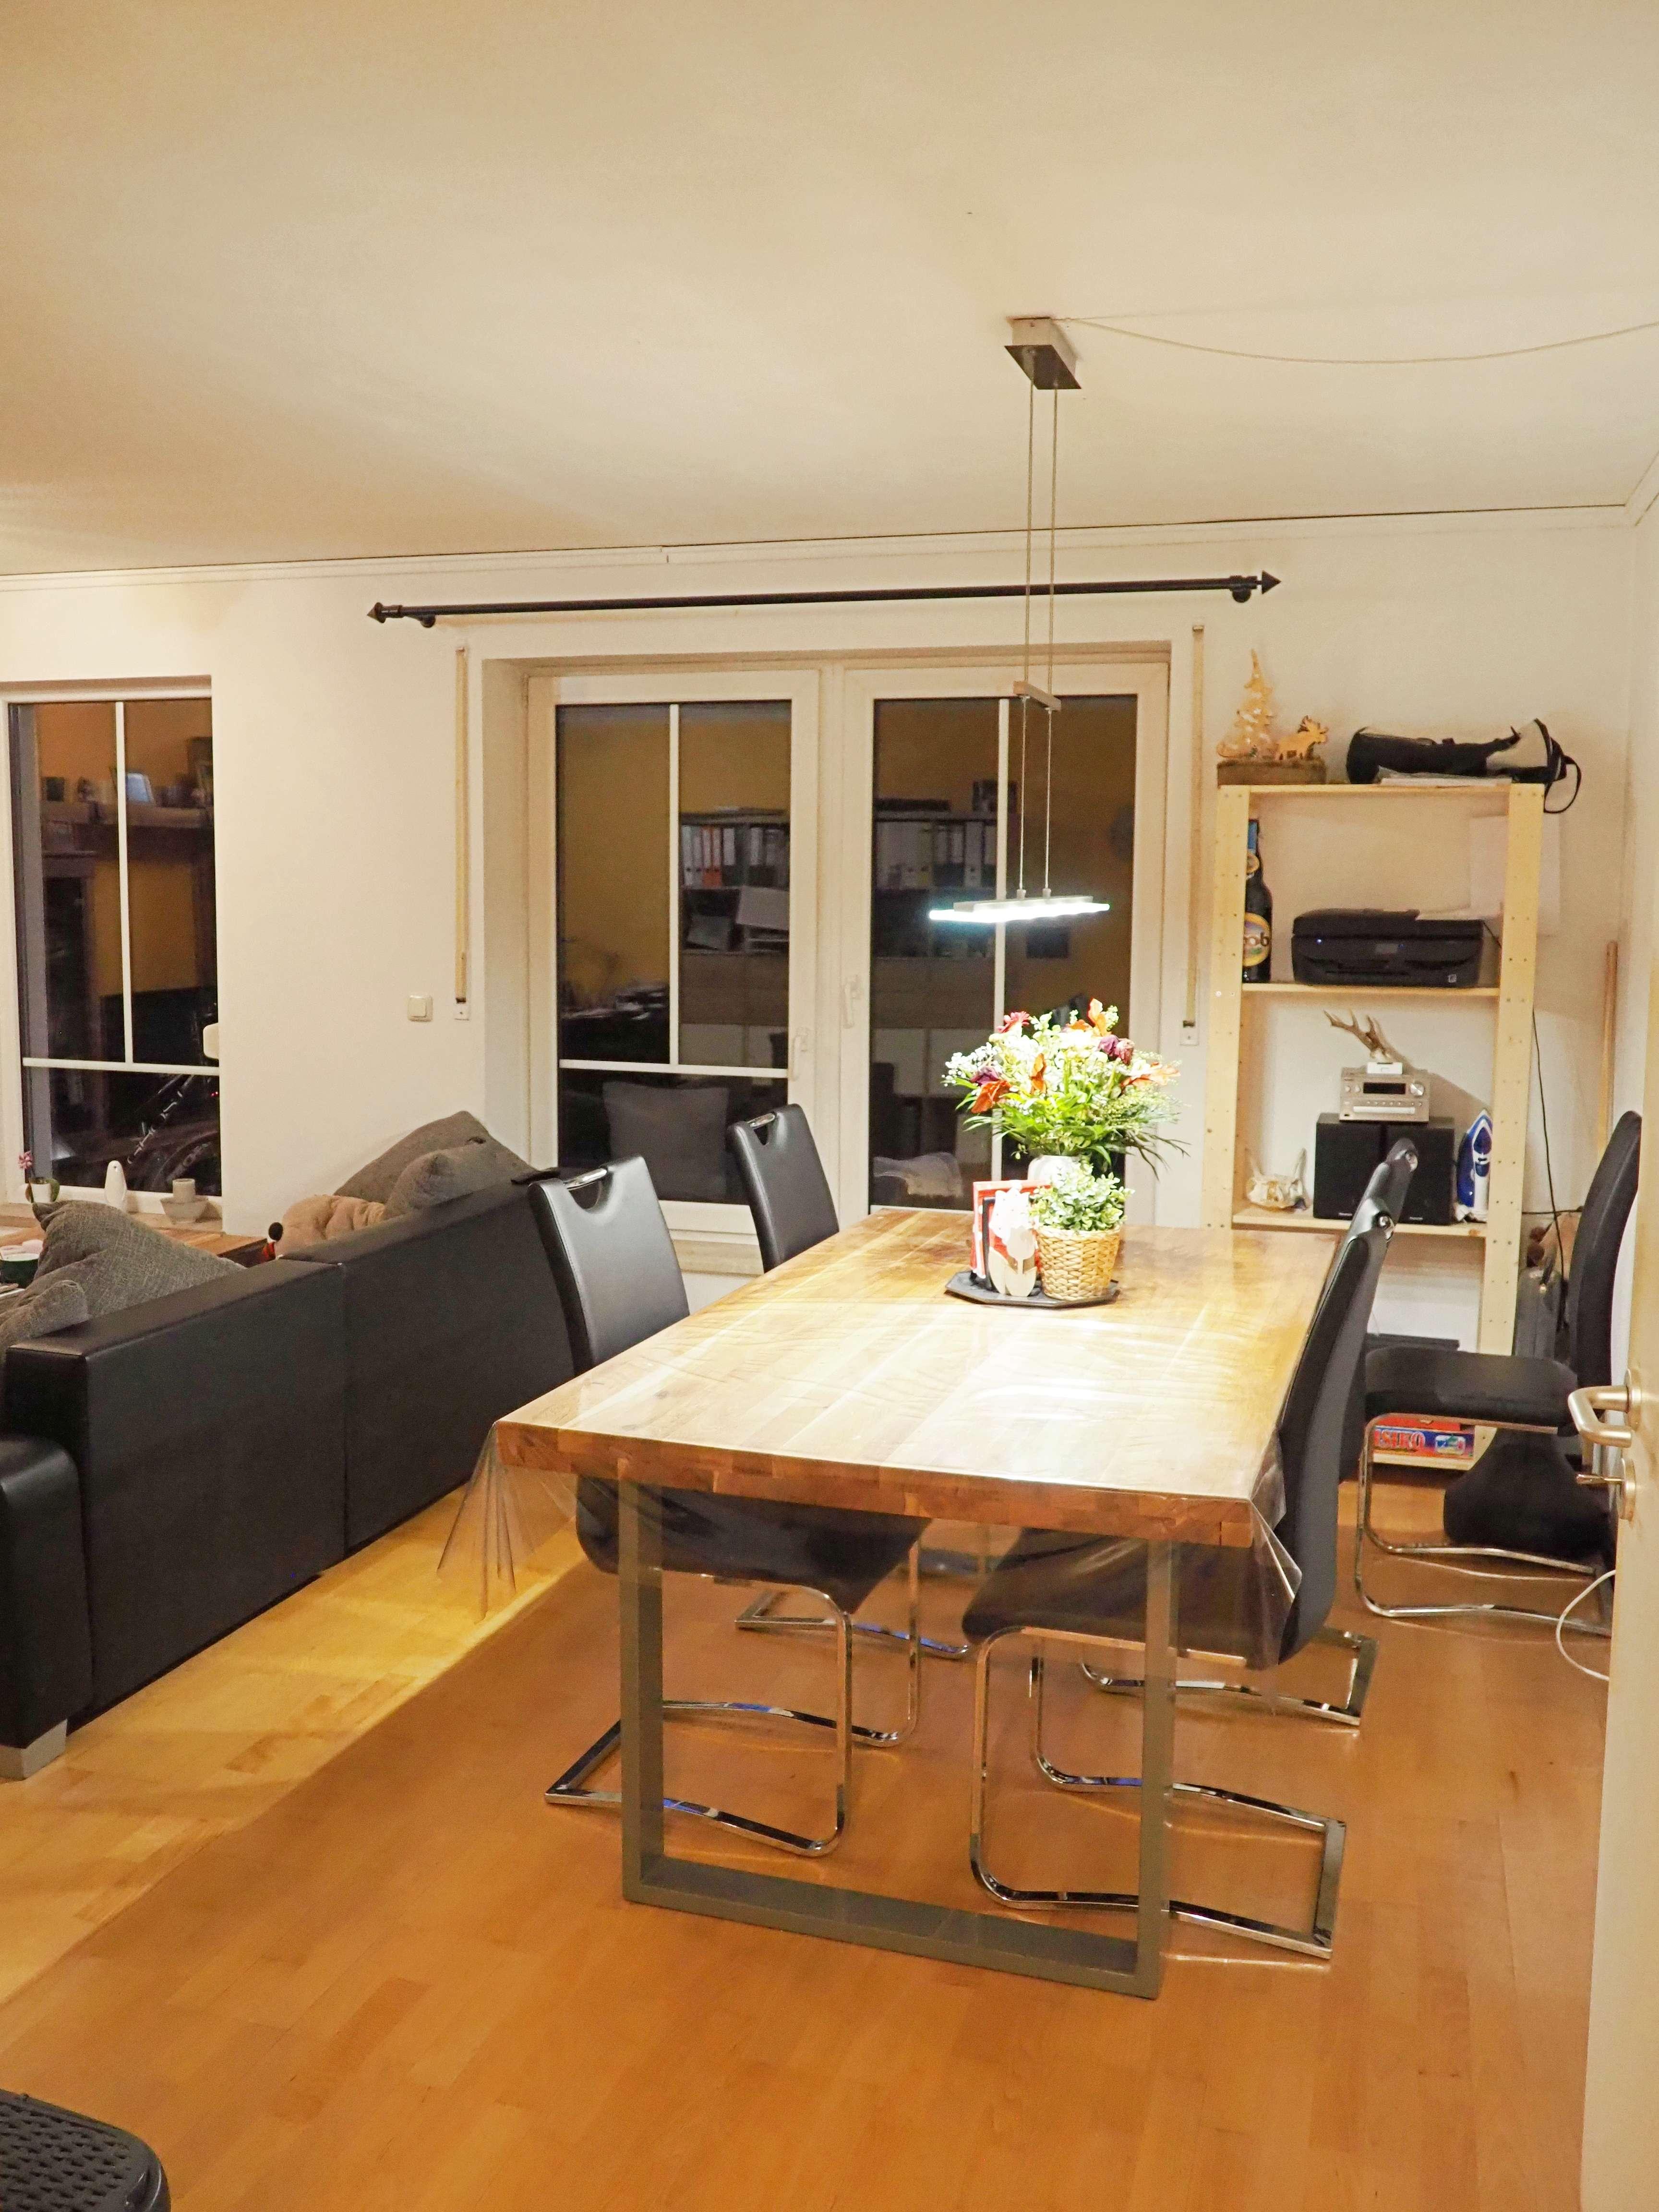 Schöne zwei Zimmer Wohnung in zentraler, ruhiger Lage in Burglengenfeld in Burglengenfeld